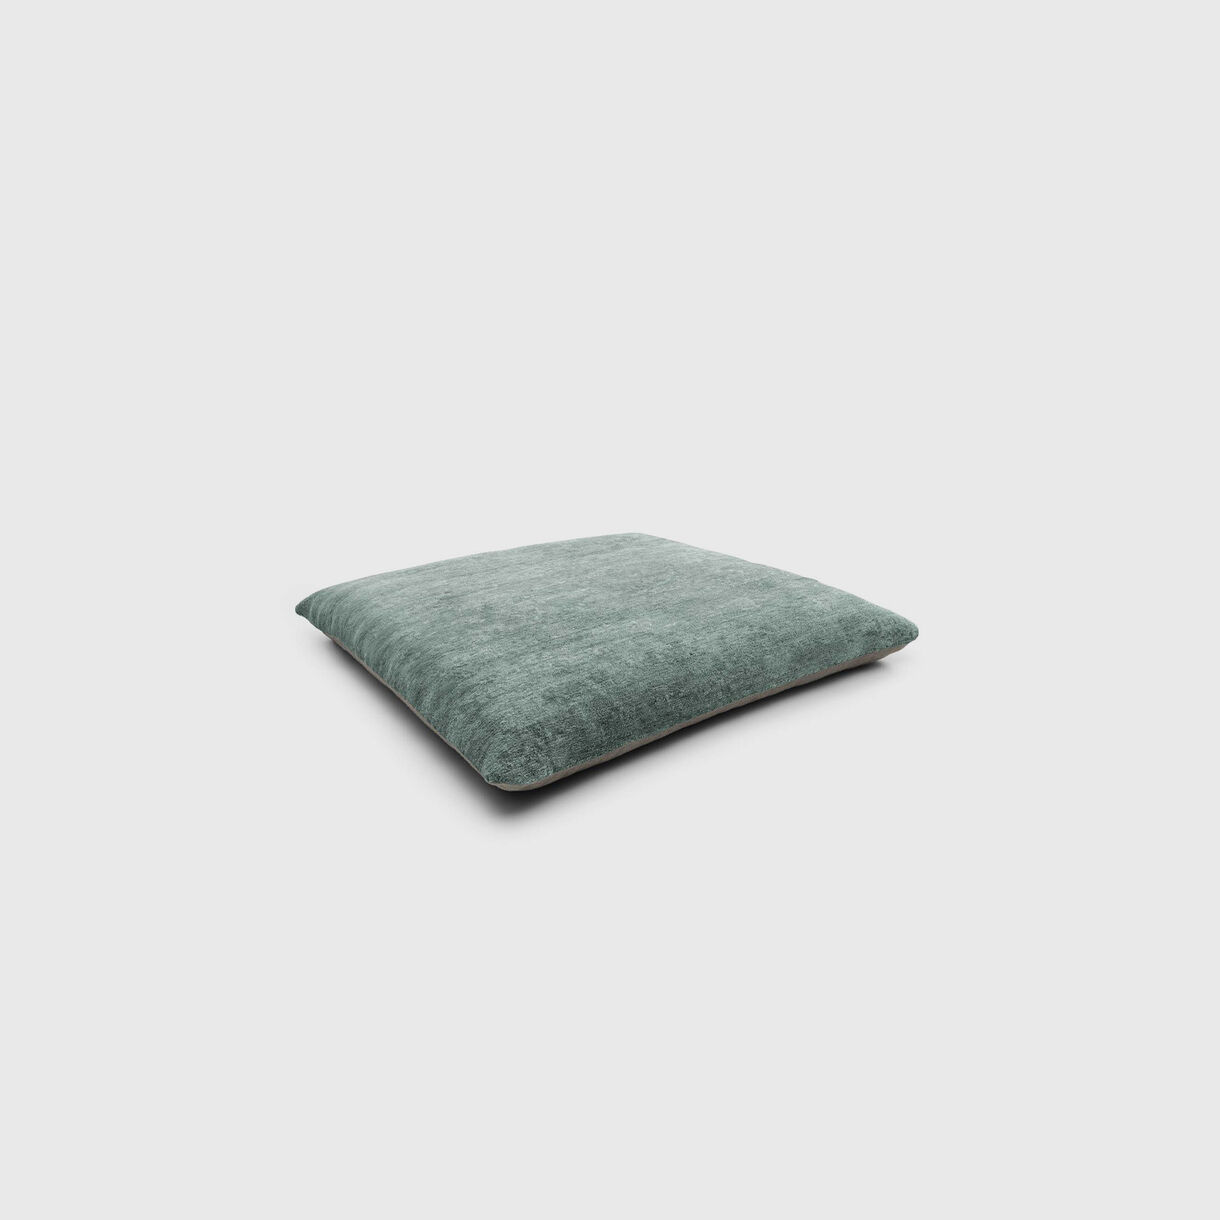 Legends of Carpets Badawi Pillow, Zumaridi